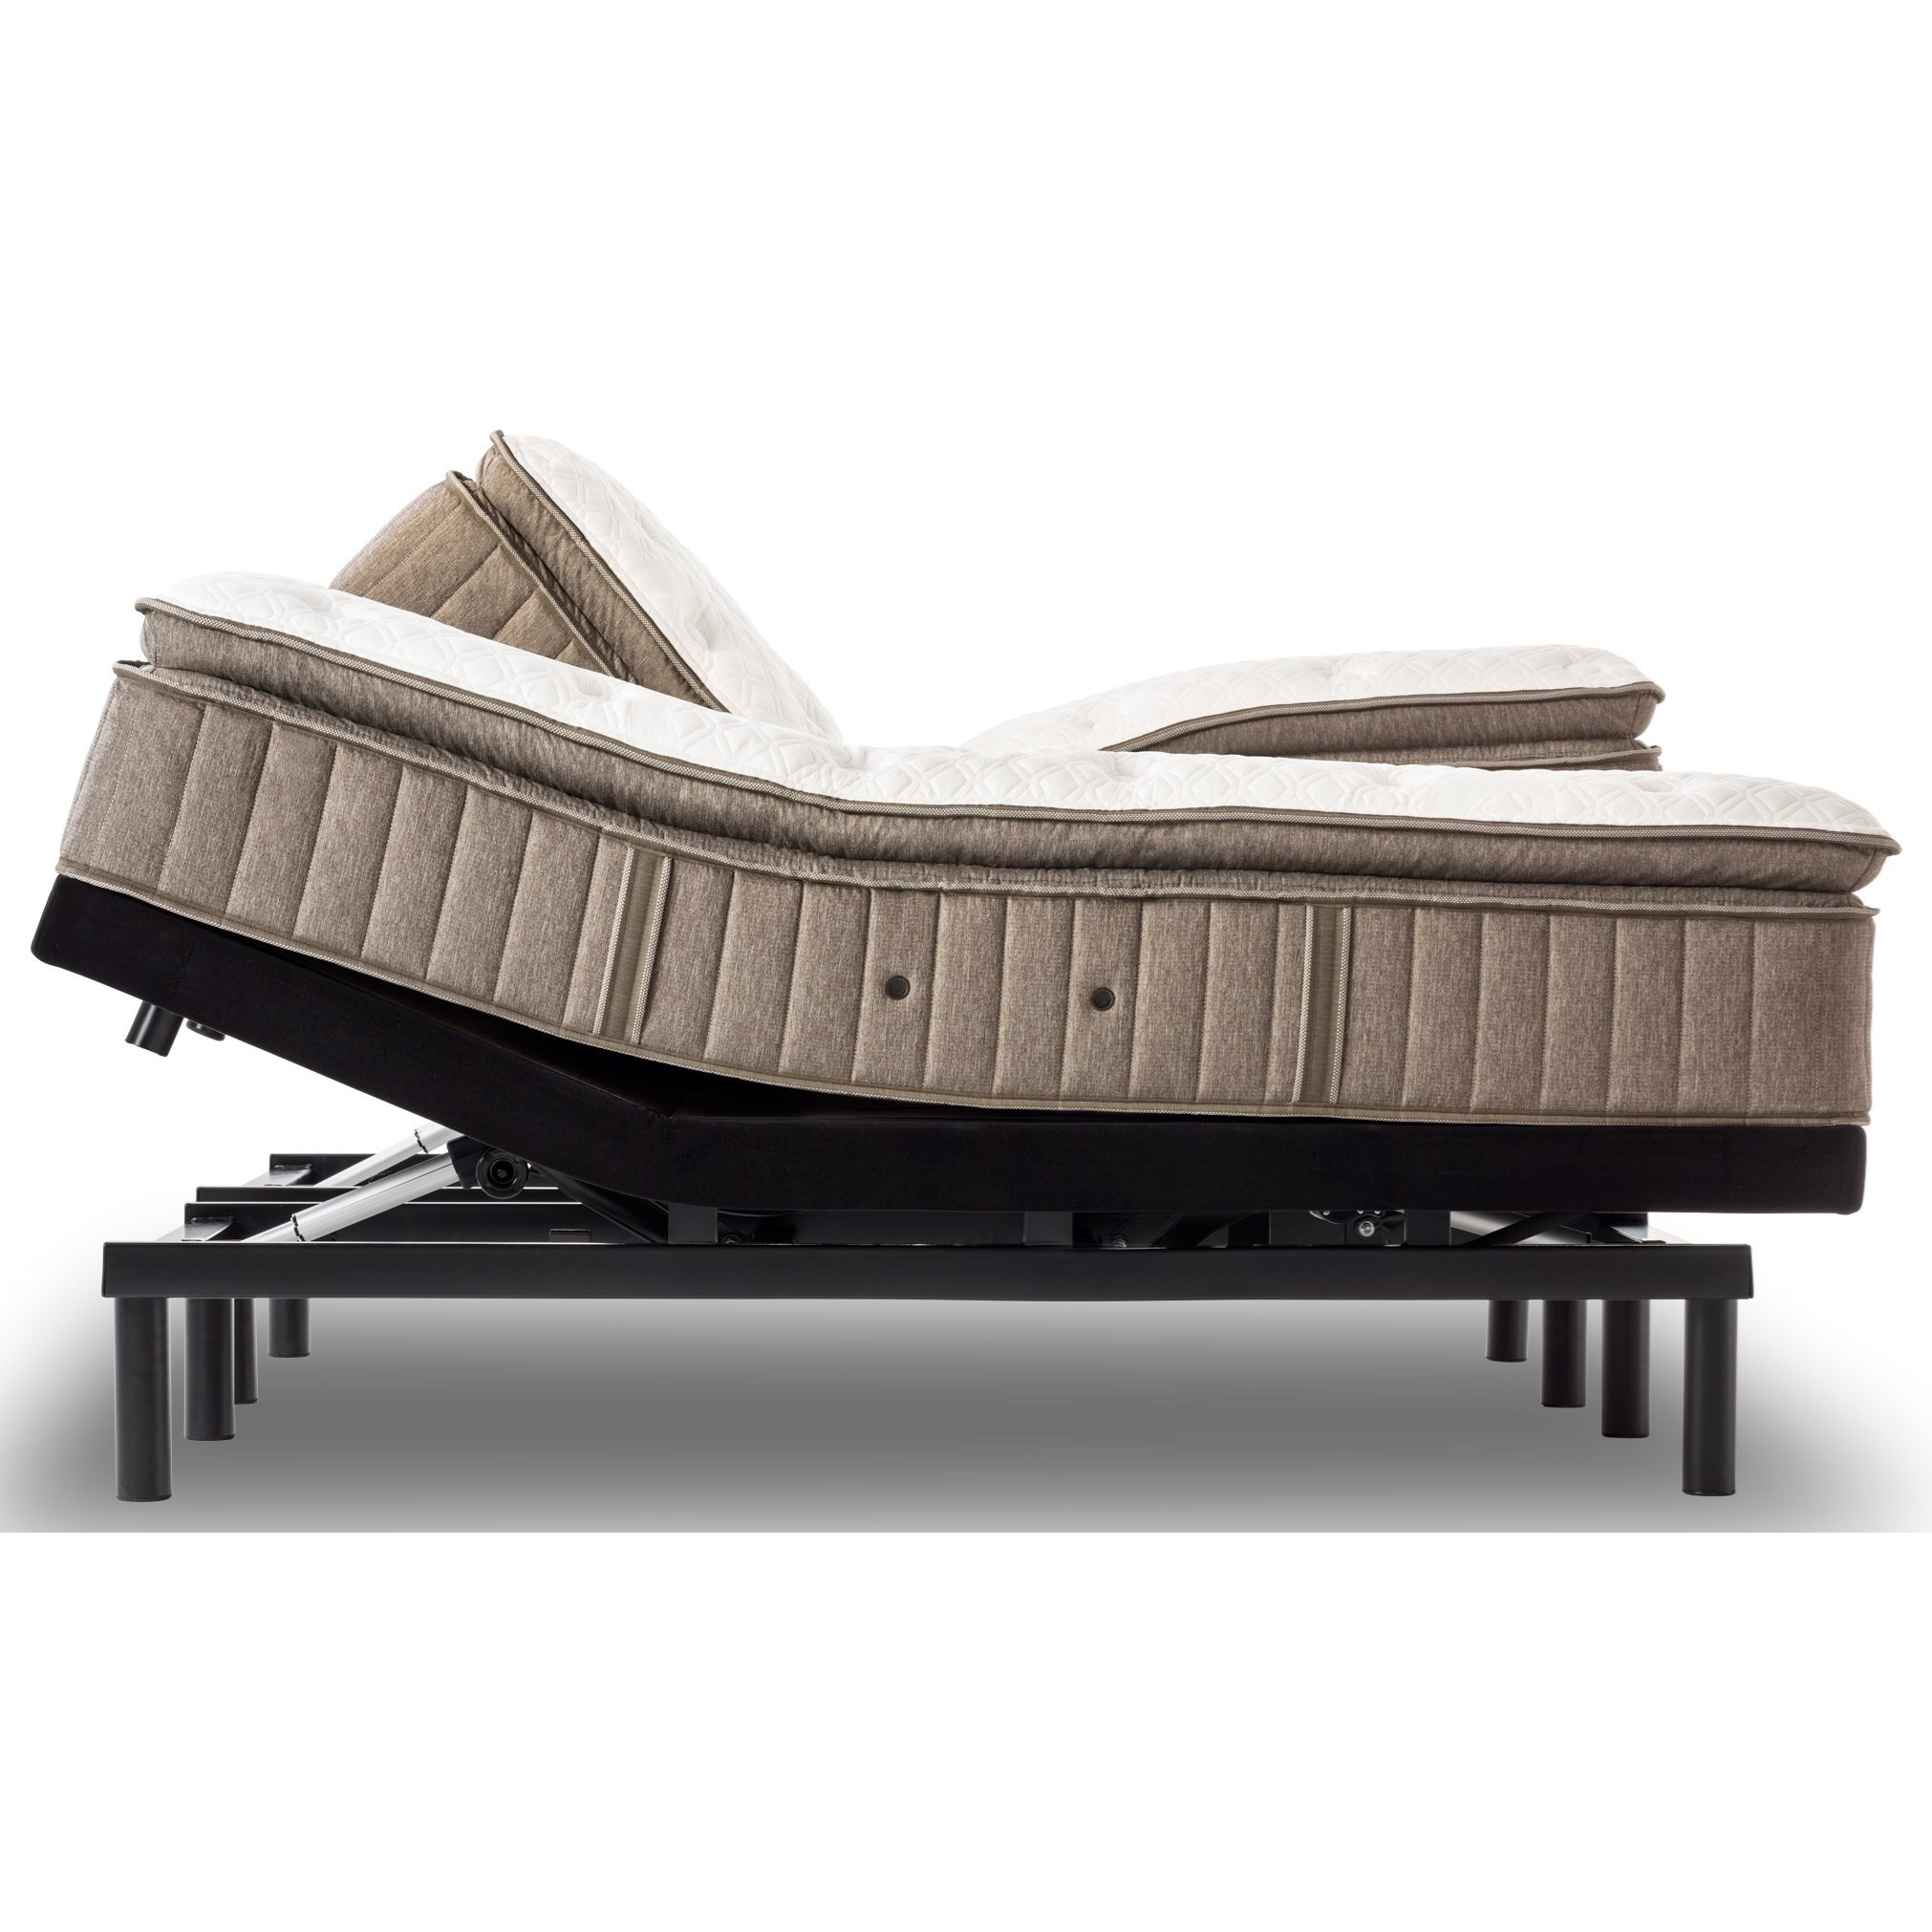 Stearns & Foster Villa Ascoli Cushion Firm Euro Top Queen Cushion Firm Euro PT Adjustable Set - Item Number: CushFirmEPT-Q+Ease-Q